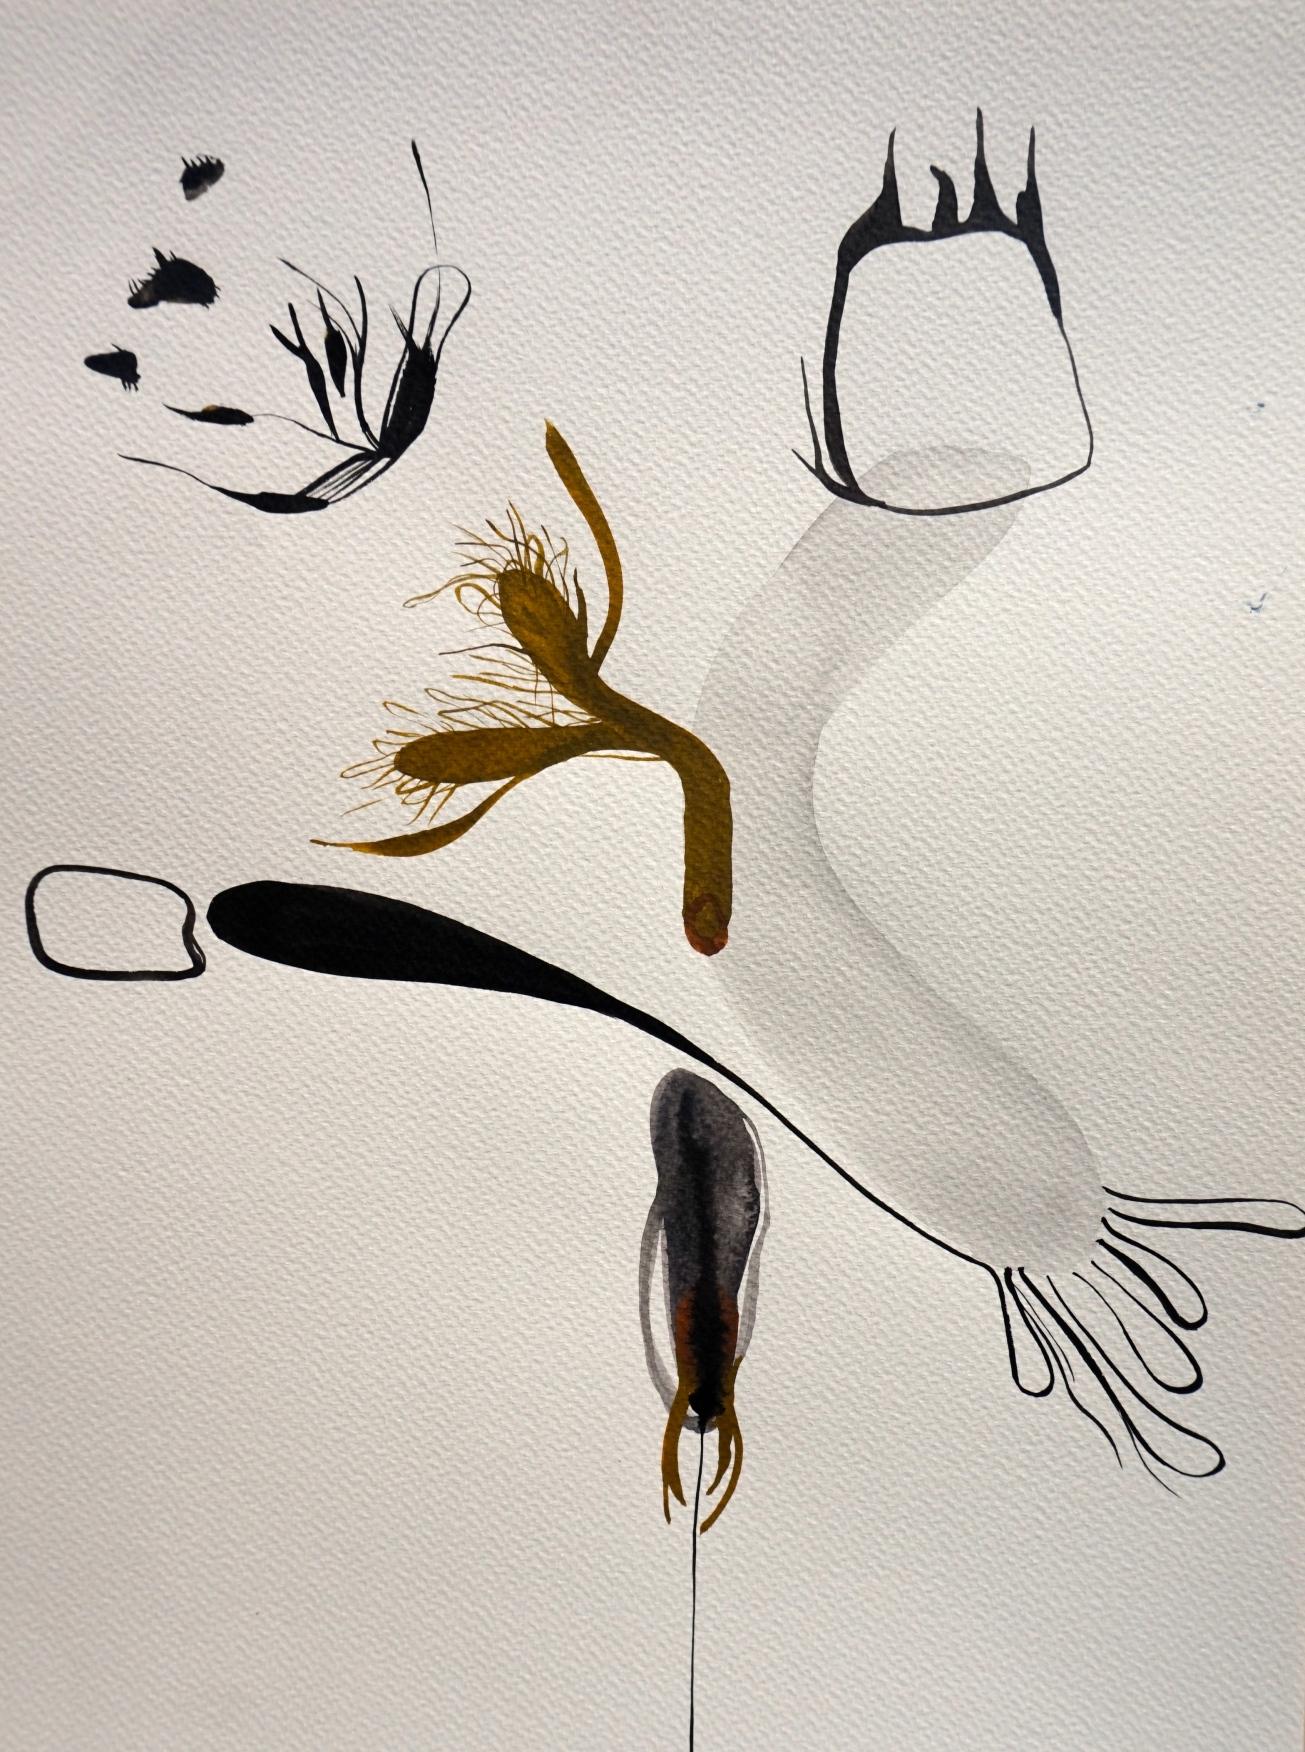 Nasty Little Creatures 2, watercolours, 30 x 40 cm, Laura Barbuto, 2014.